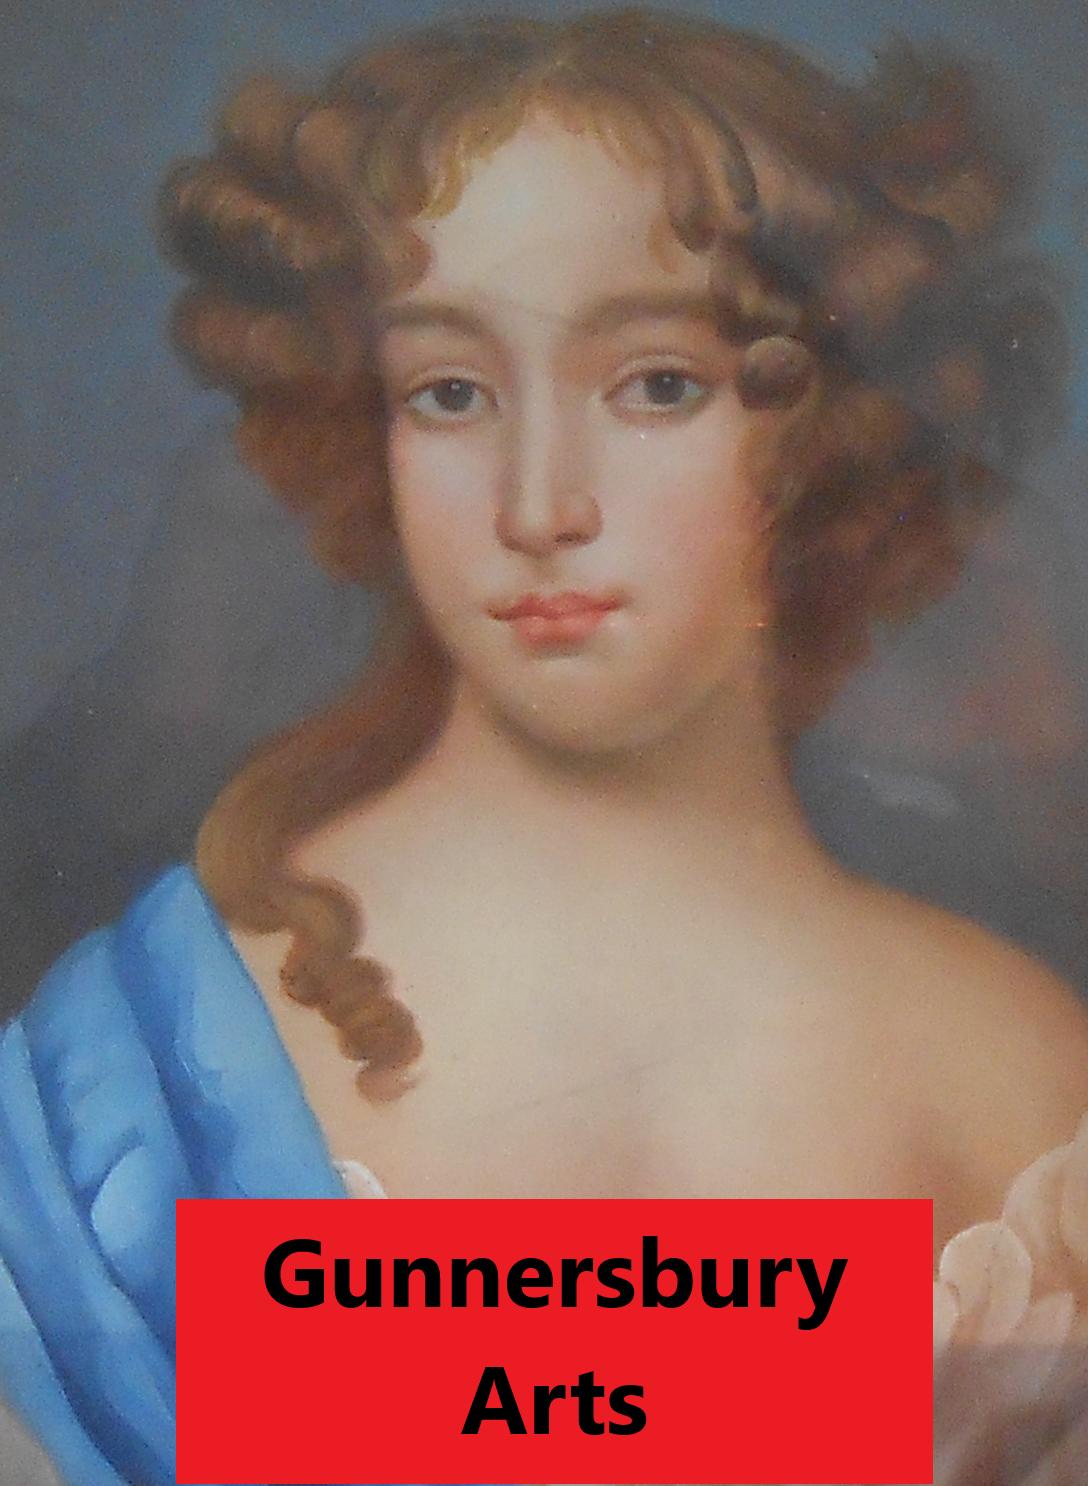 Gunnersbury Arts Limited